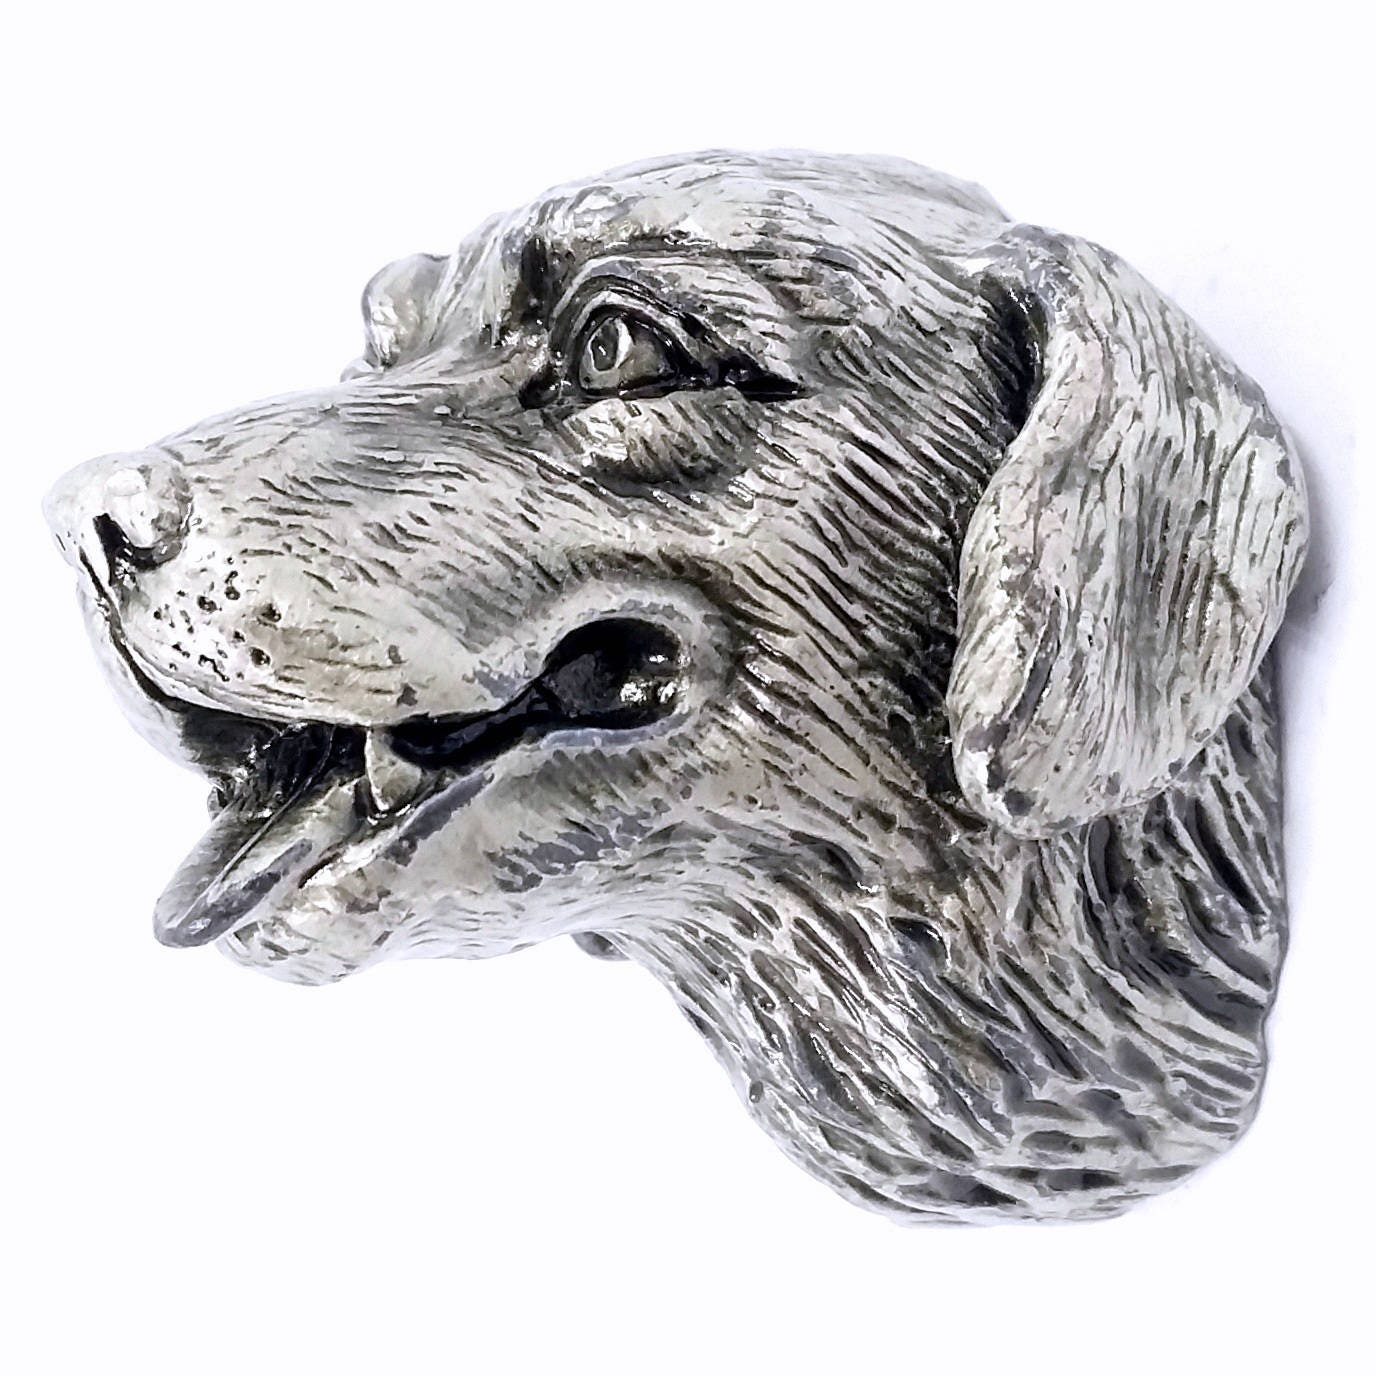 Hunde Knäufe Griffe / Knauf / Tier Antik Silber / Türgriffe